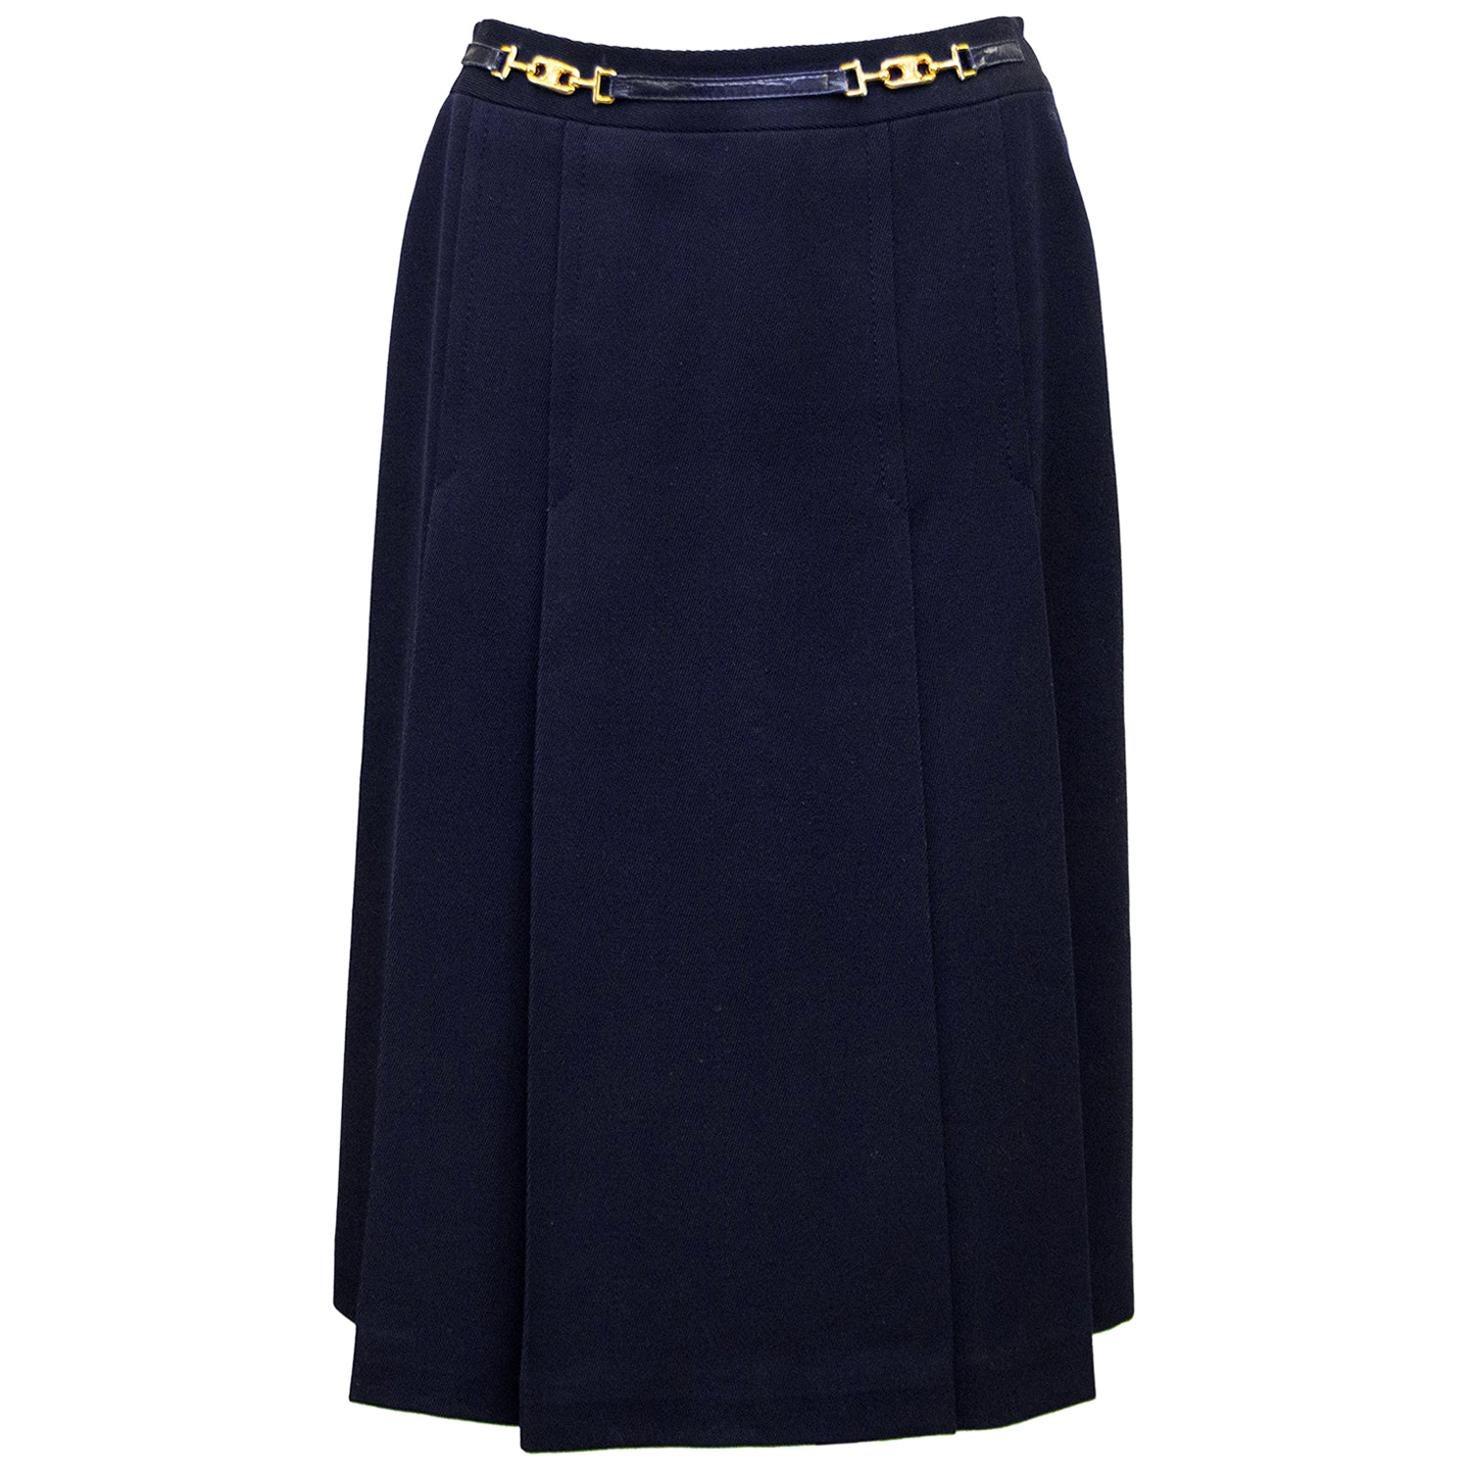 1970s Celine Navy Wool Gabardine Pleated Skirt